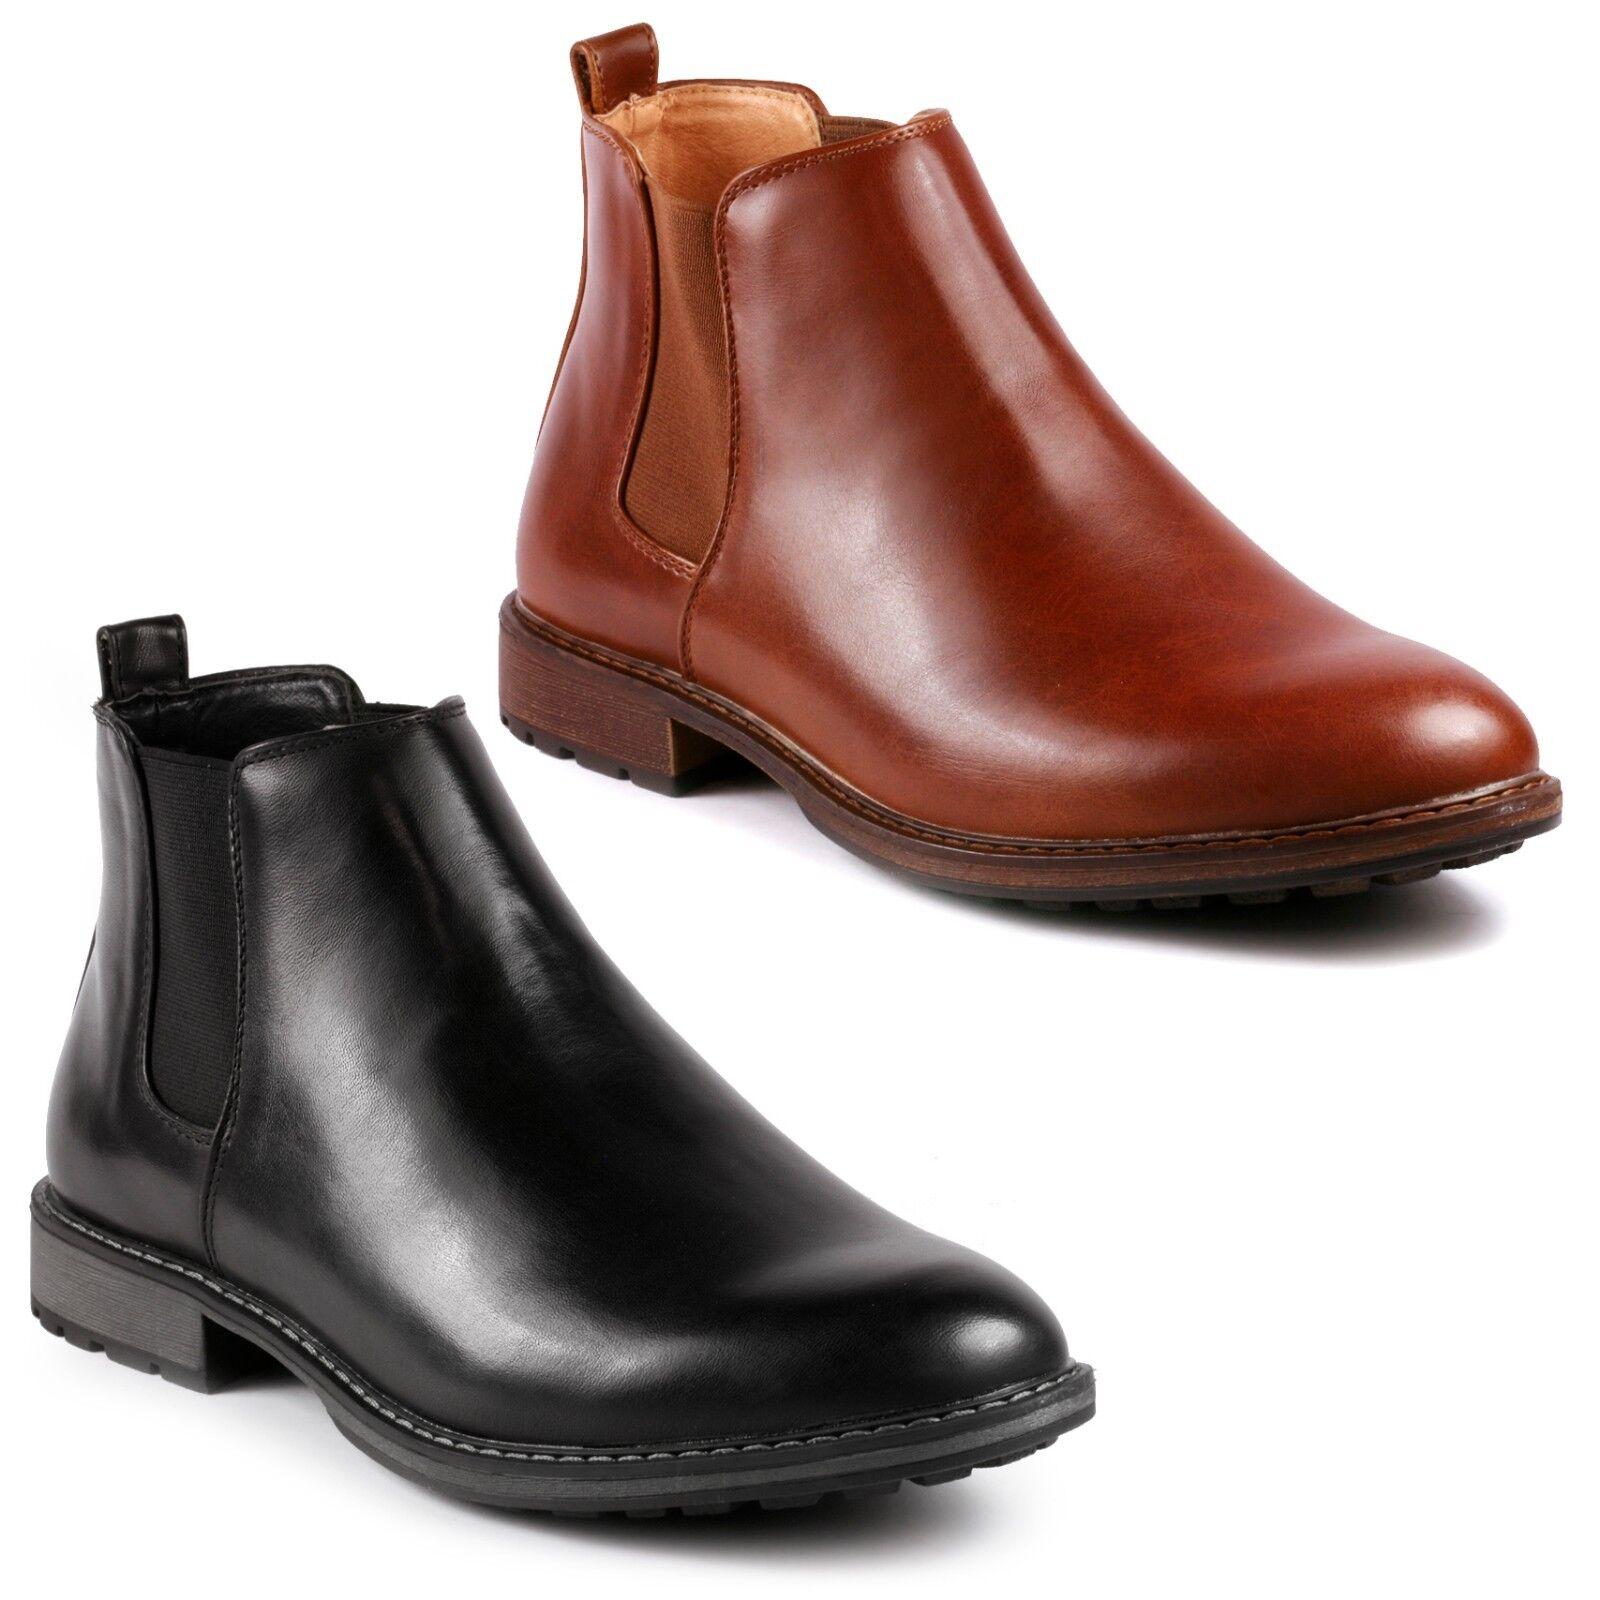 Metrocharm MC137 Men's Casual Fashion Ankle Chelsea Boots